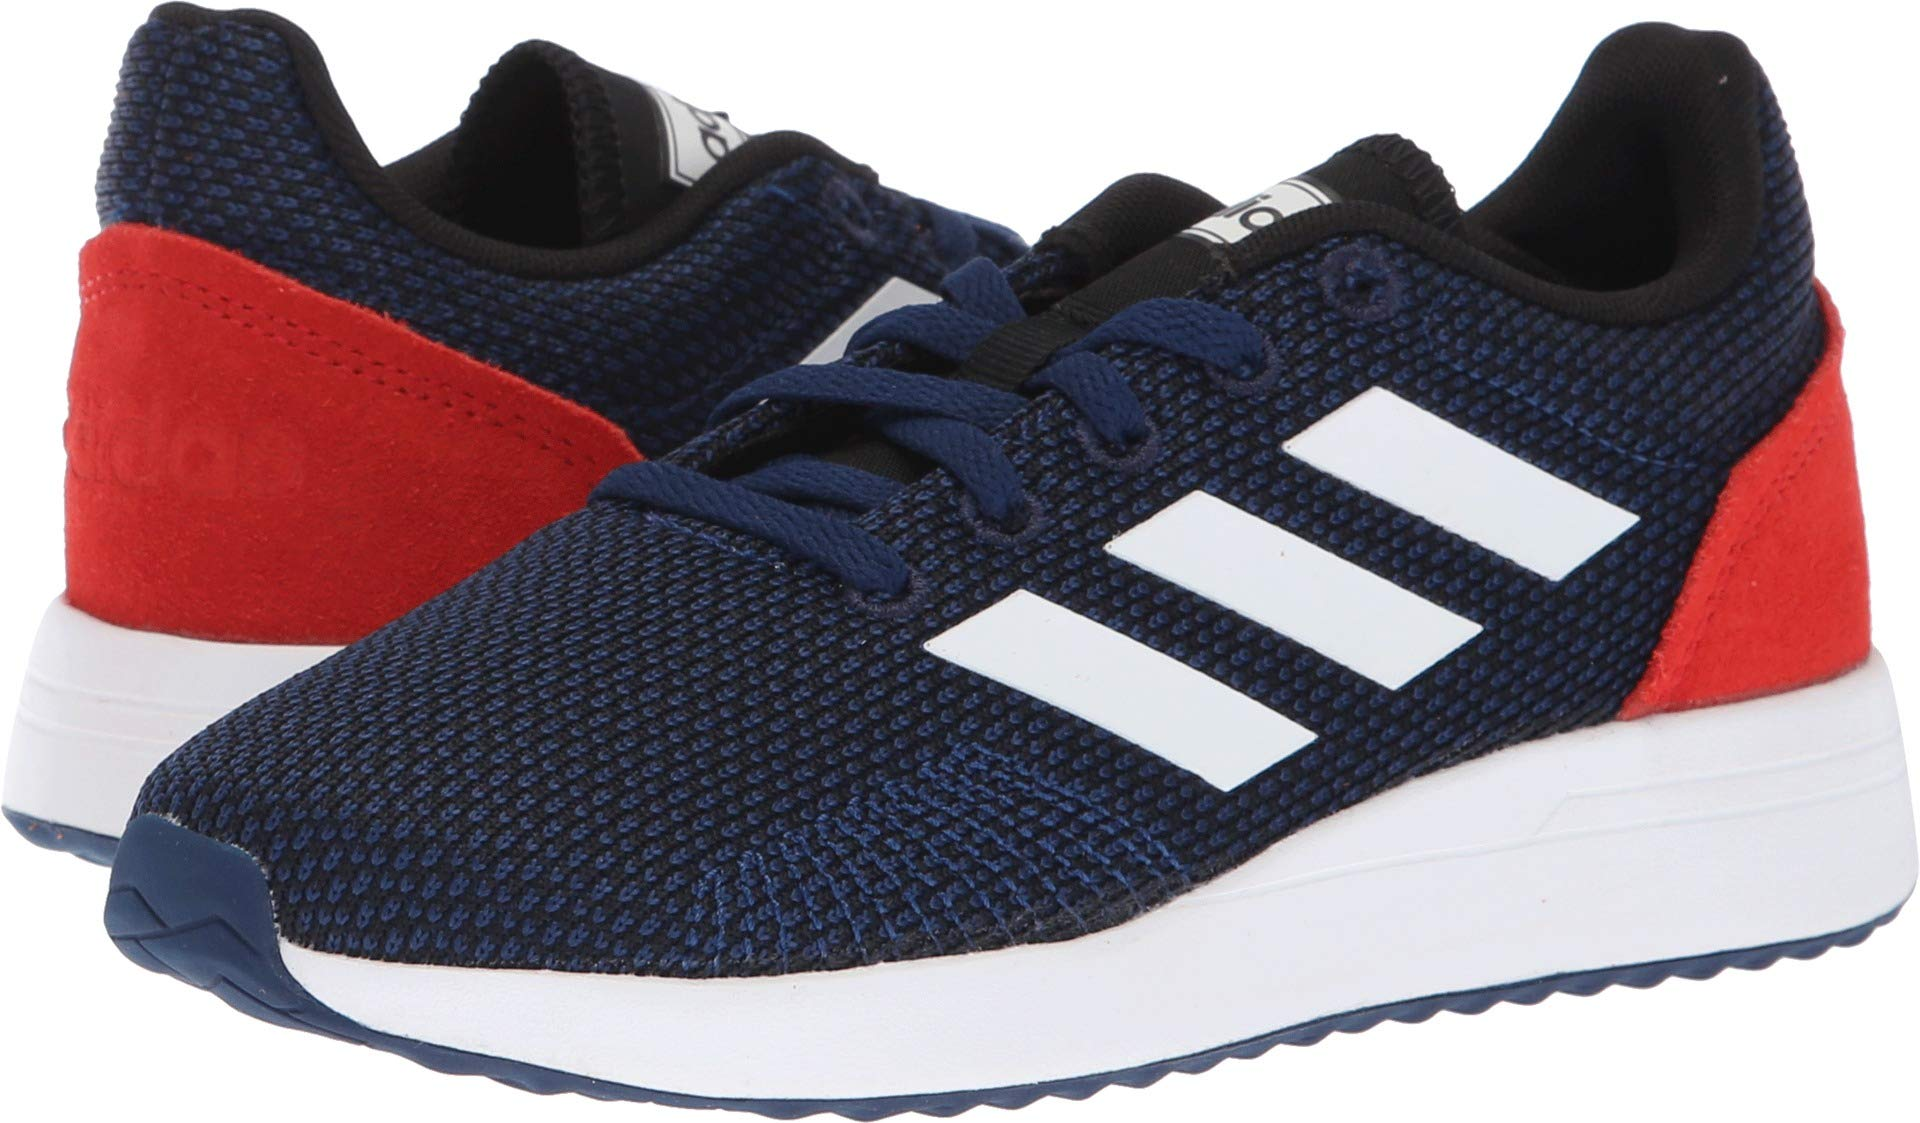 adidas Unisex Run70S Running Shoe, Dark Blue/White/hi-res red, 5 M US Big Kid